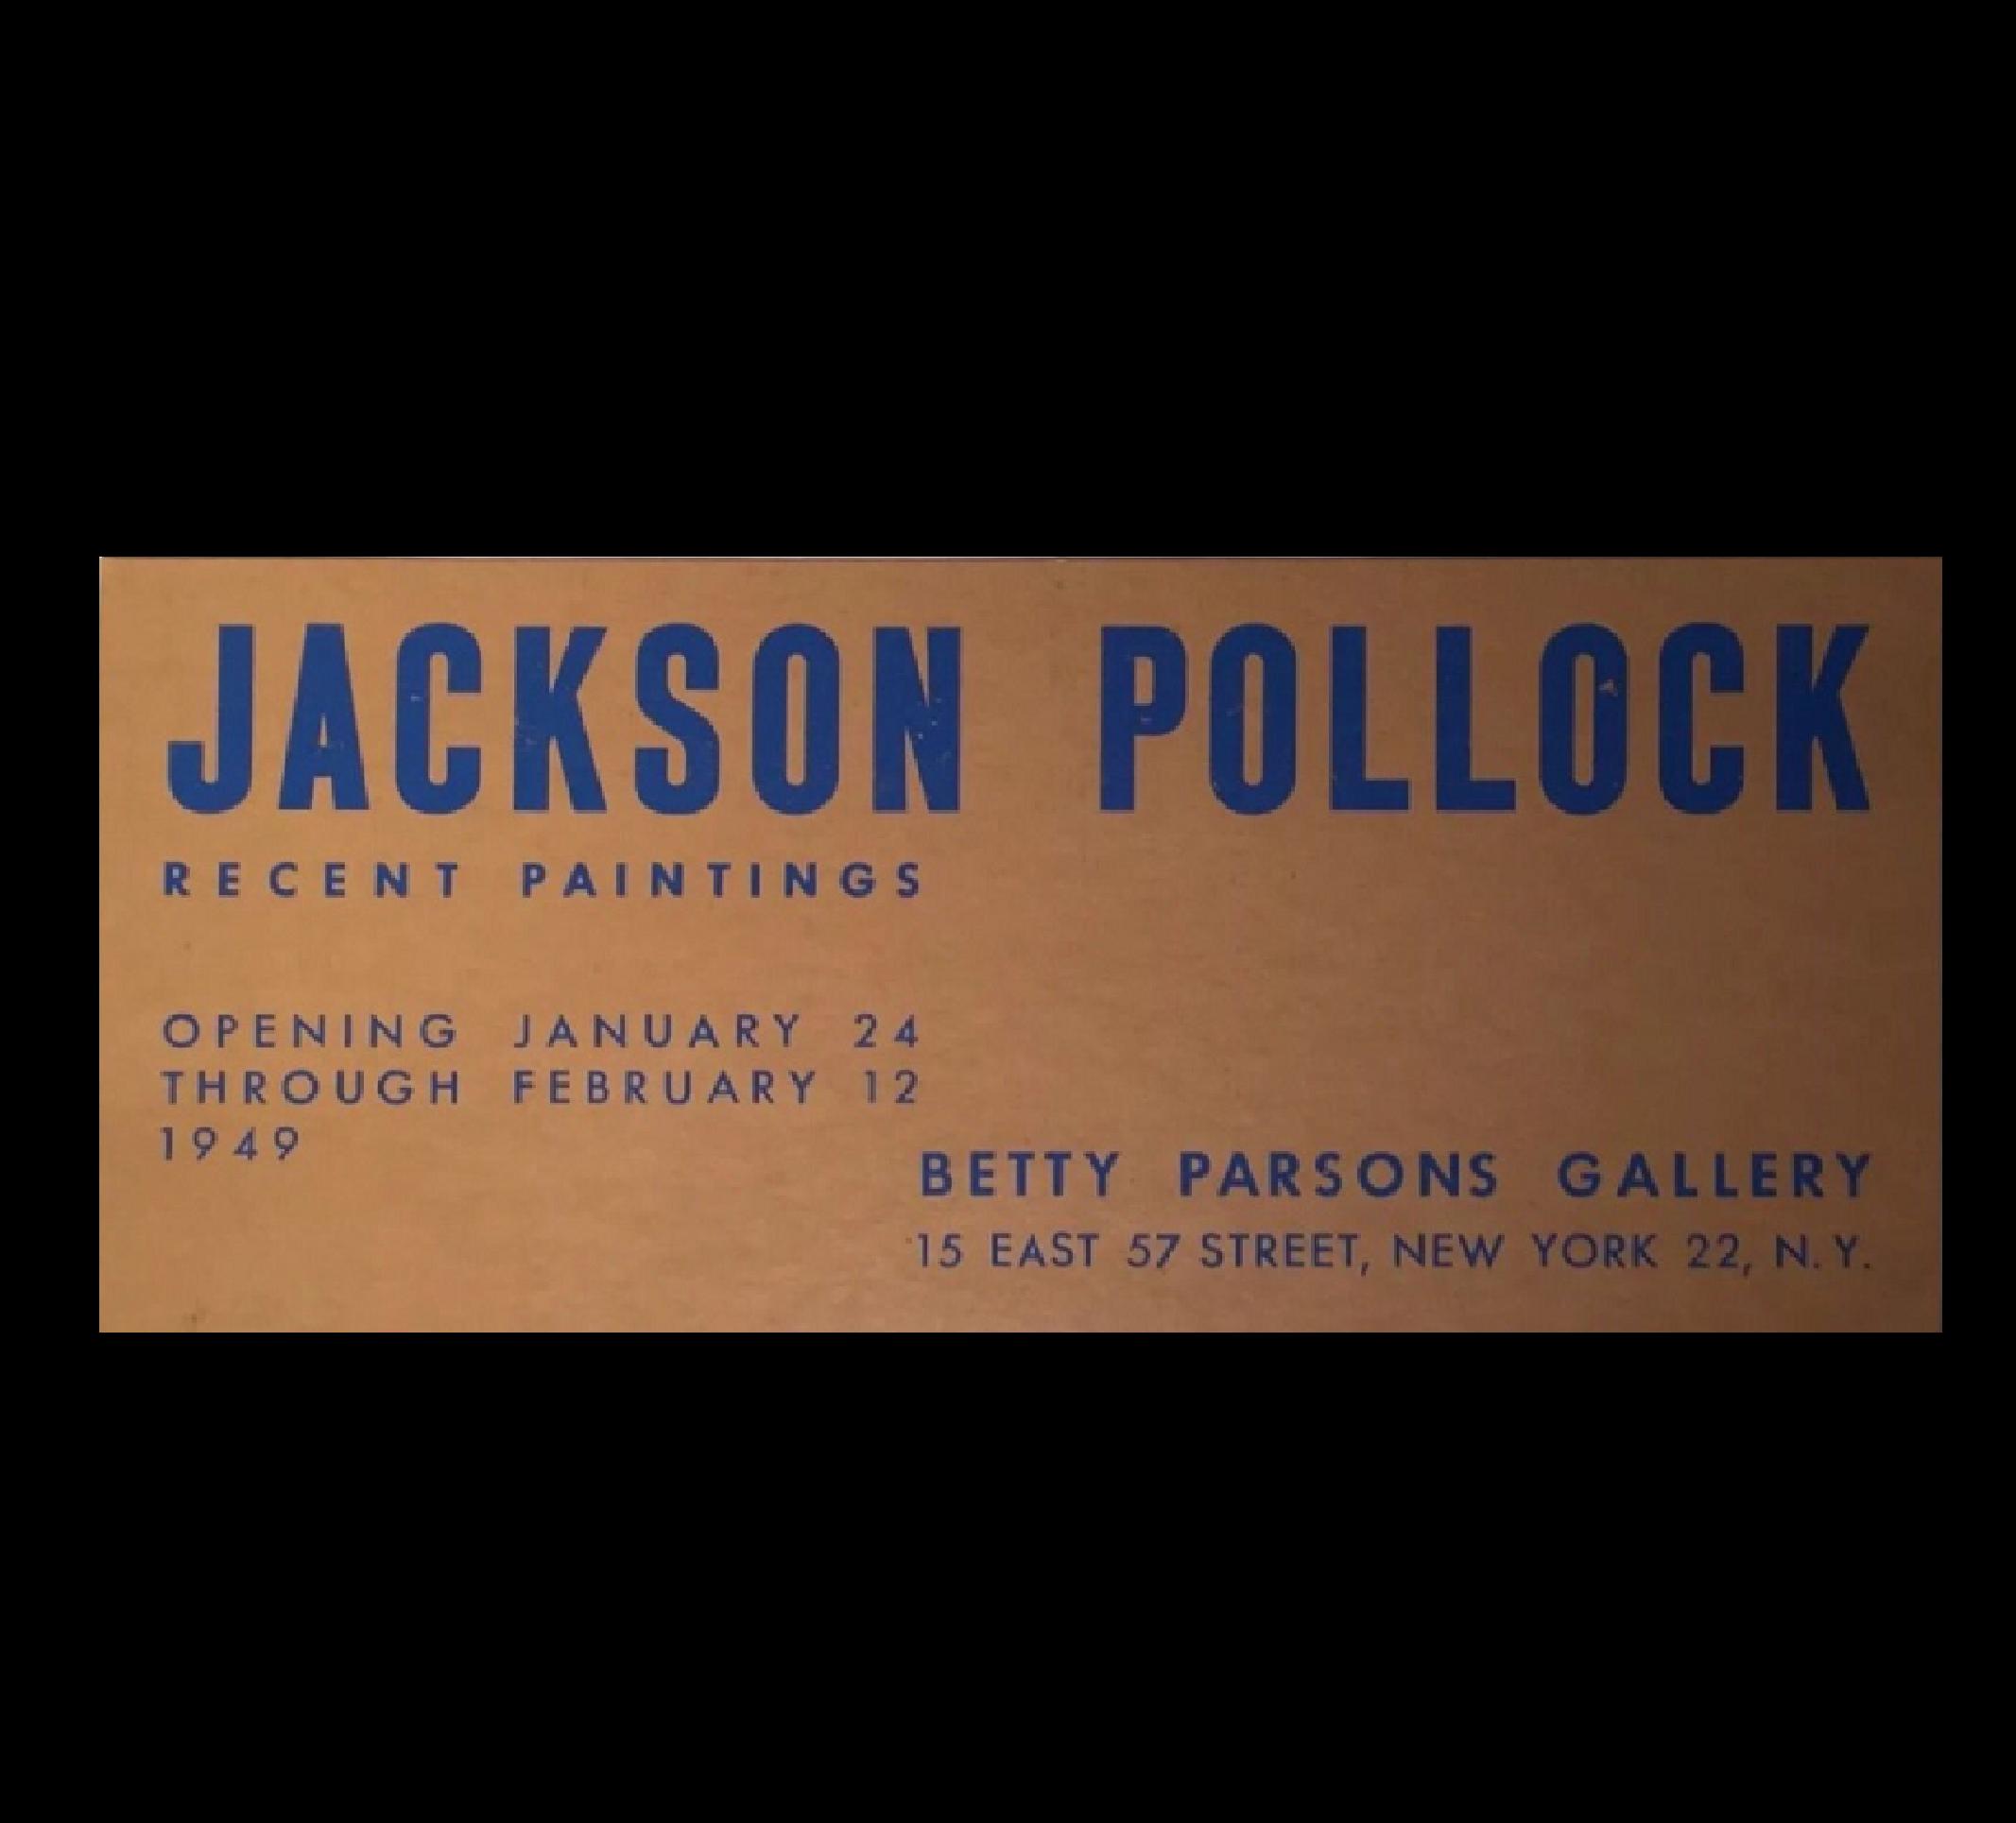 """Jackson Pollock"",  1949, exhibition invitation, Betty Parsons Gallery NYC."